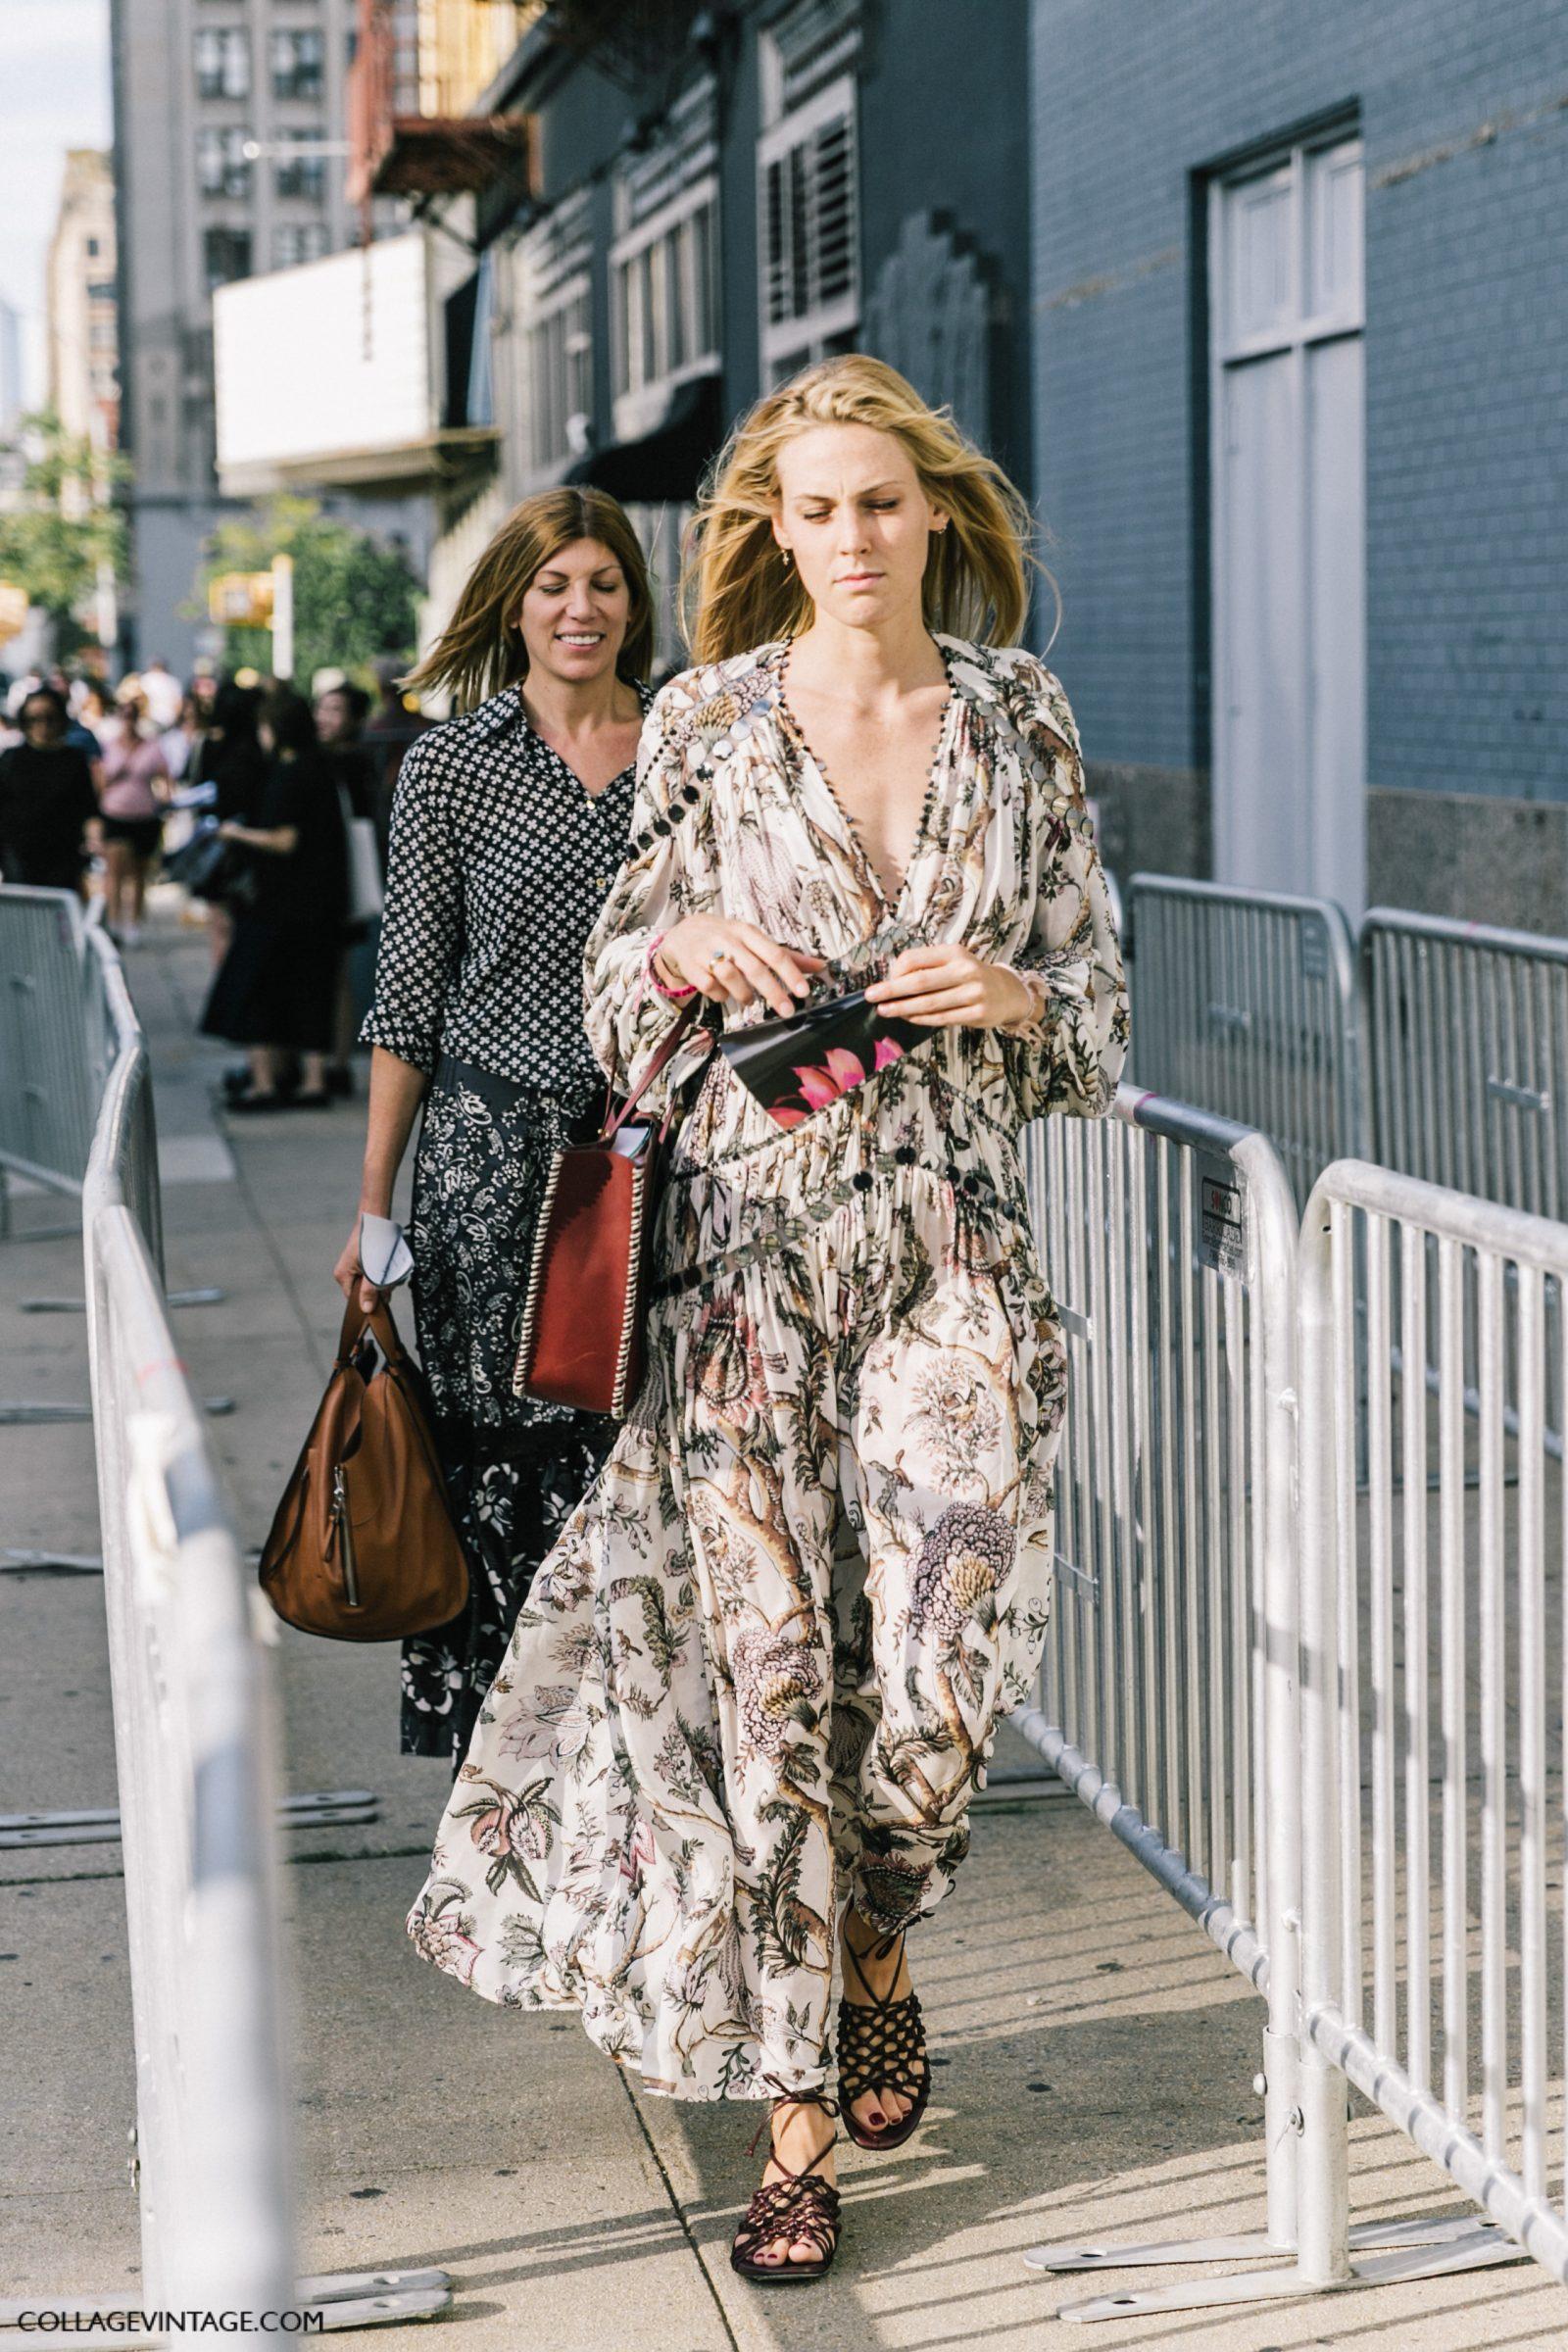 nyfw-new_york_fashion_week_ss17-street_style-outfits-collage_vintage-vintage-atuzarra-71